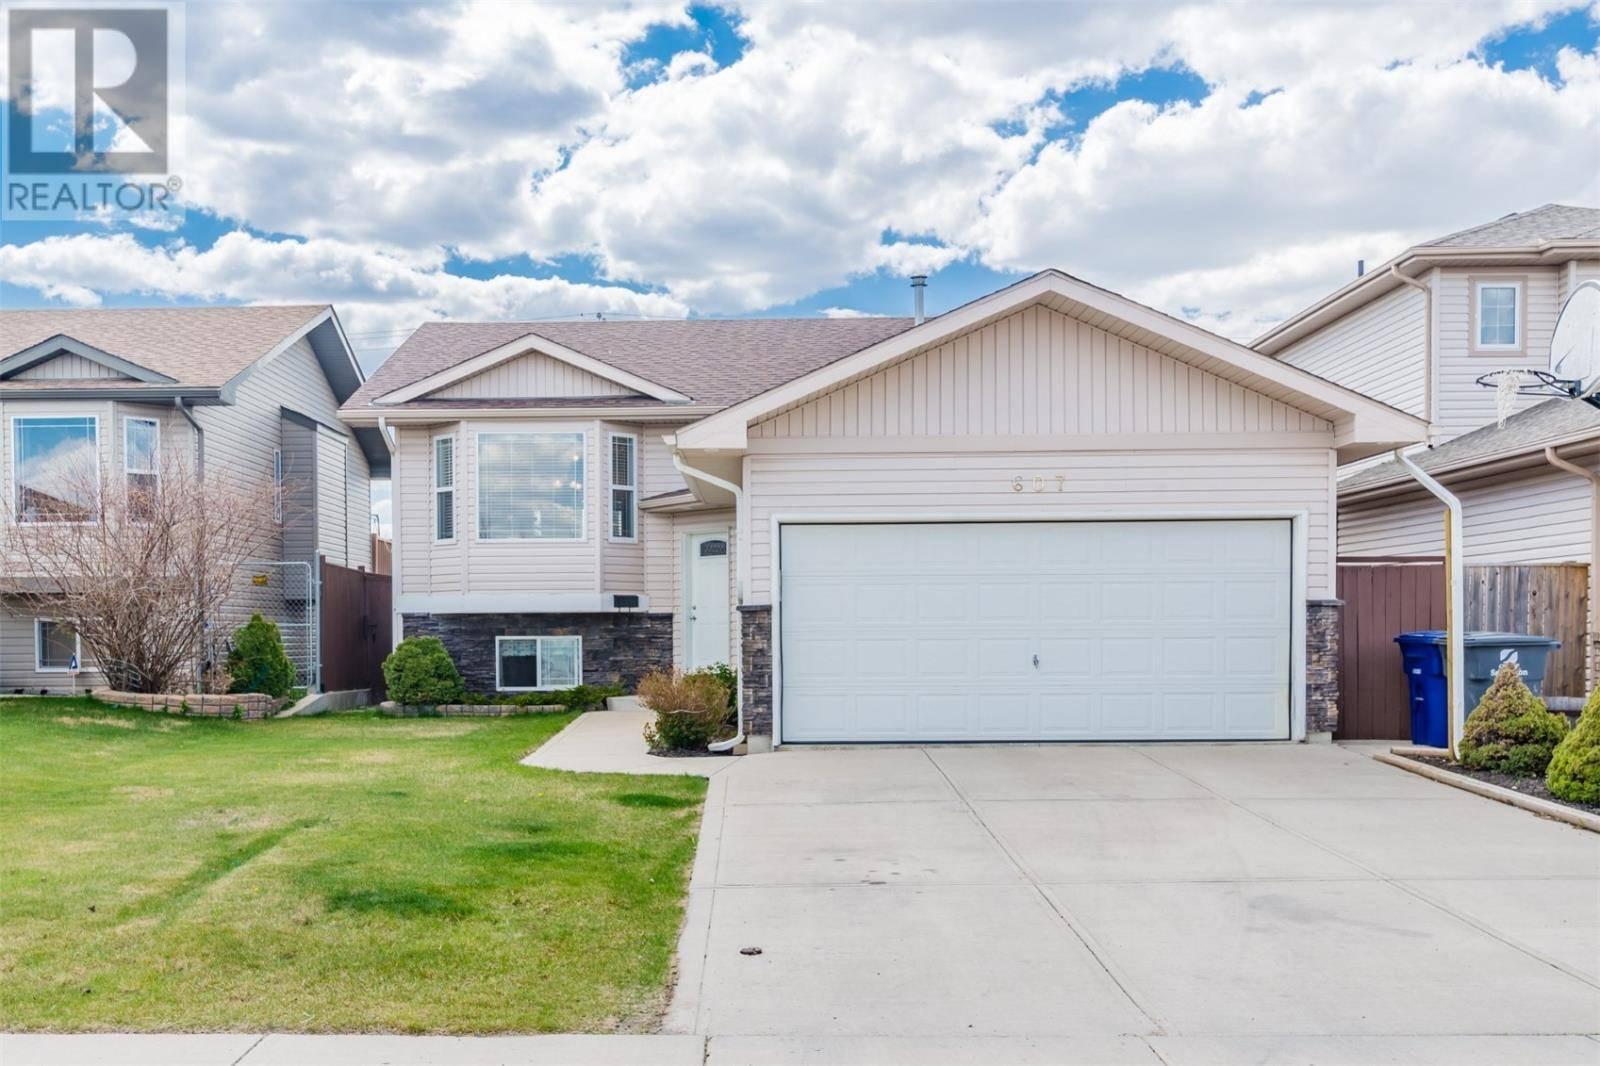 House for sale at 607 Overholt Cres Saskatoon Saskatchewan - MLS: SK772943